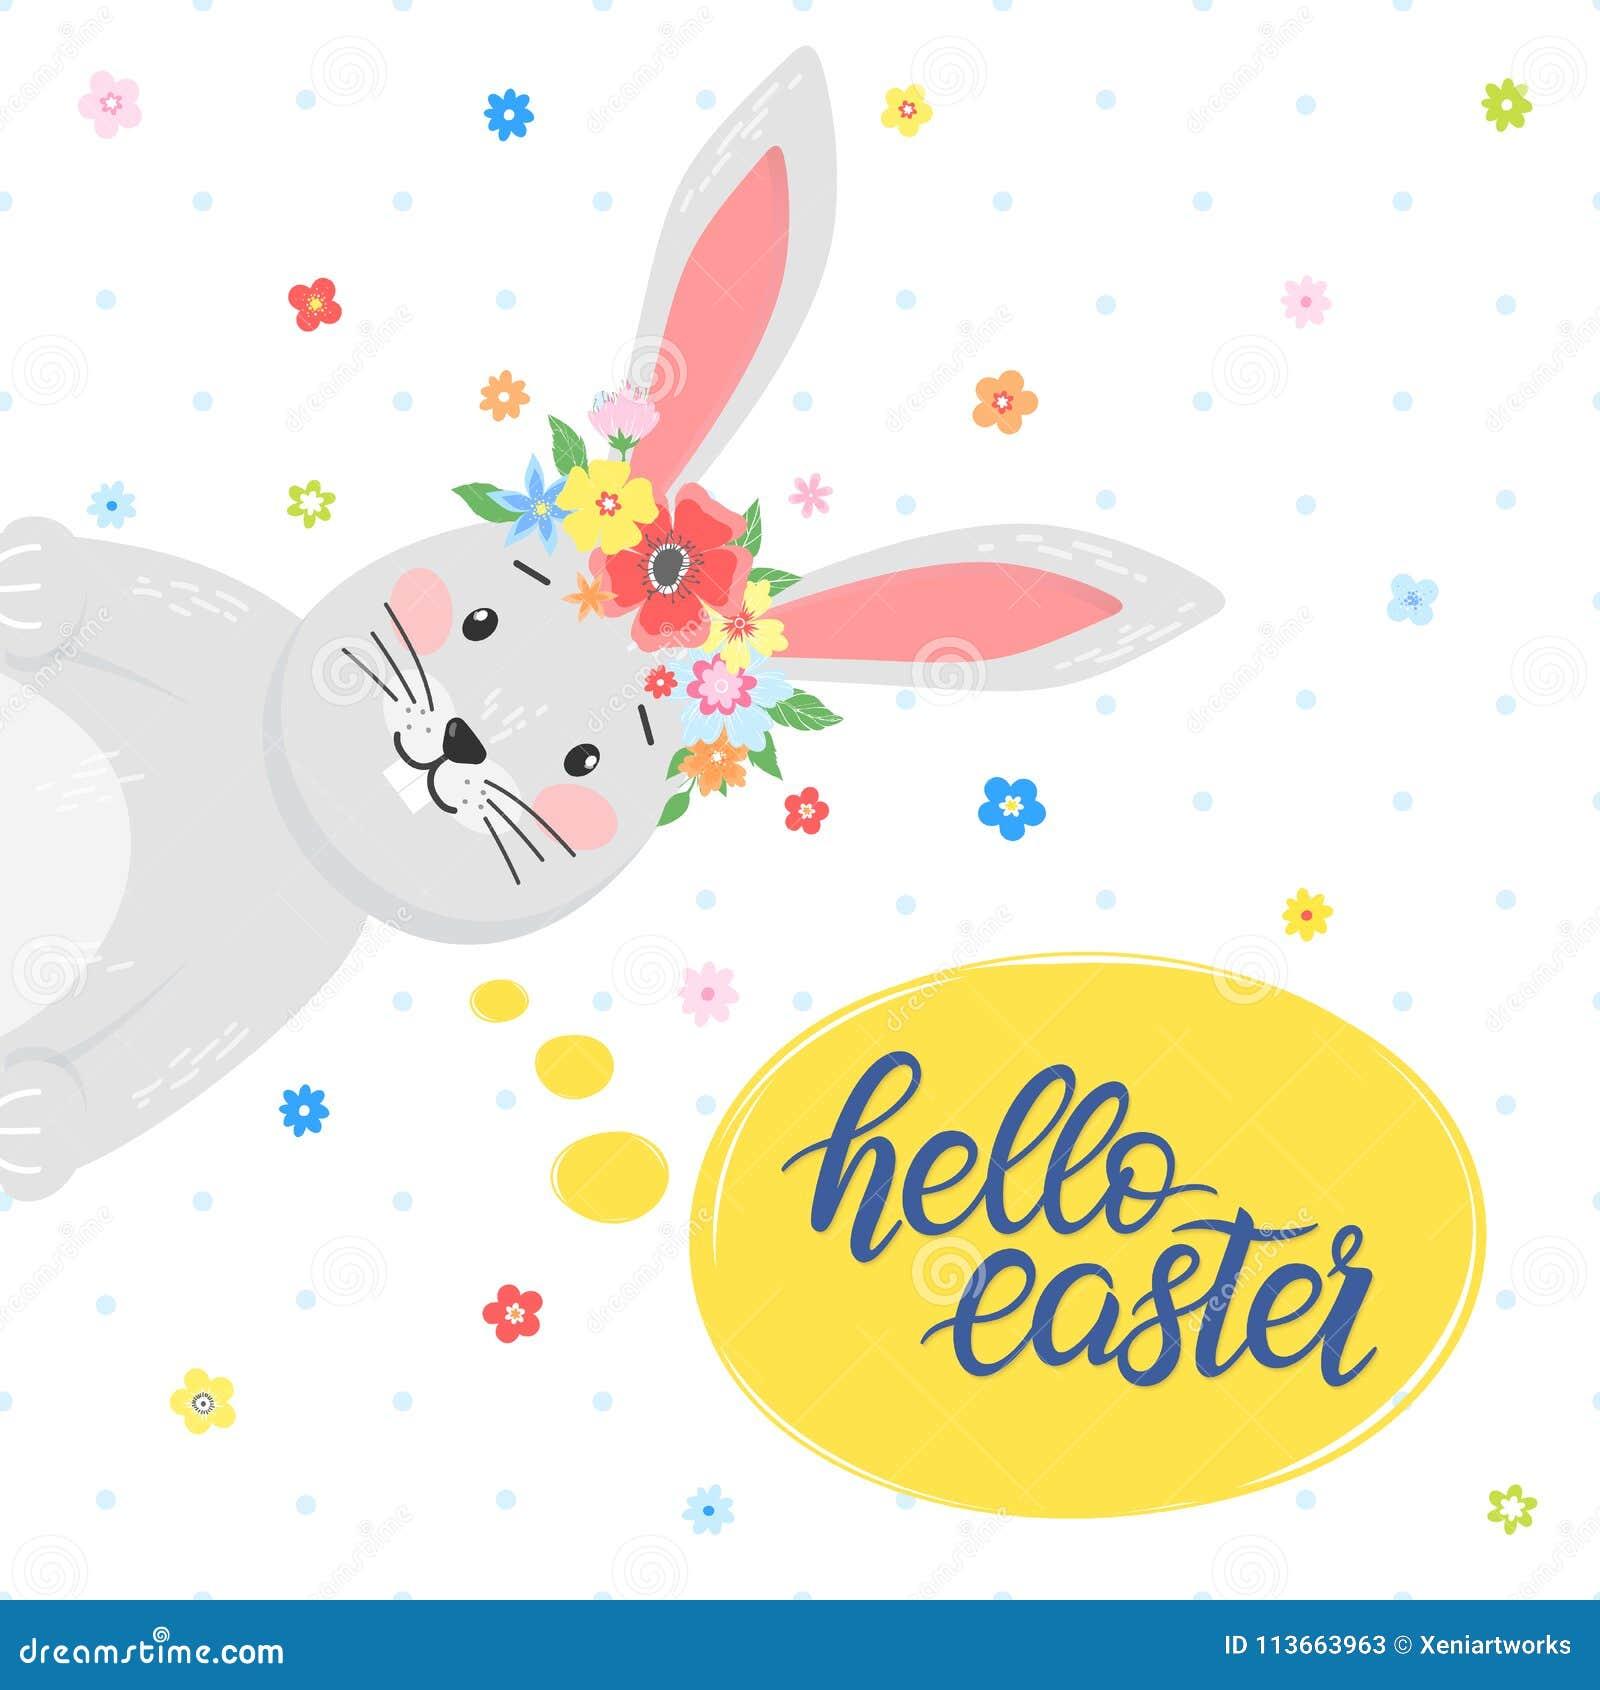 Easter seasons greetings card stock illustration illustration of easter seasons greetings card m4hsunfo